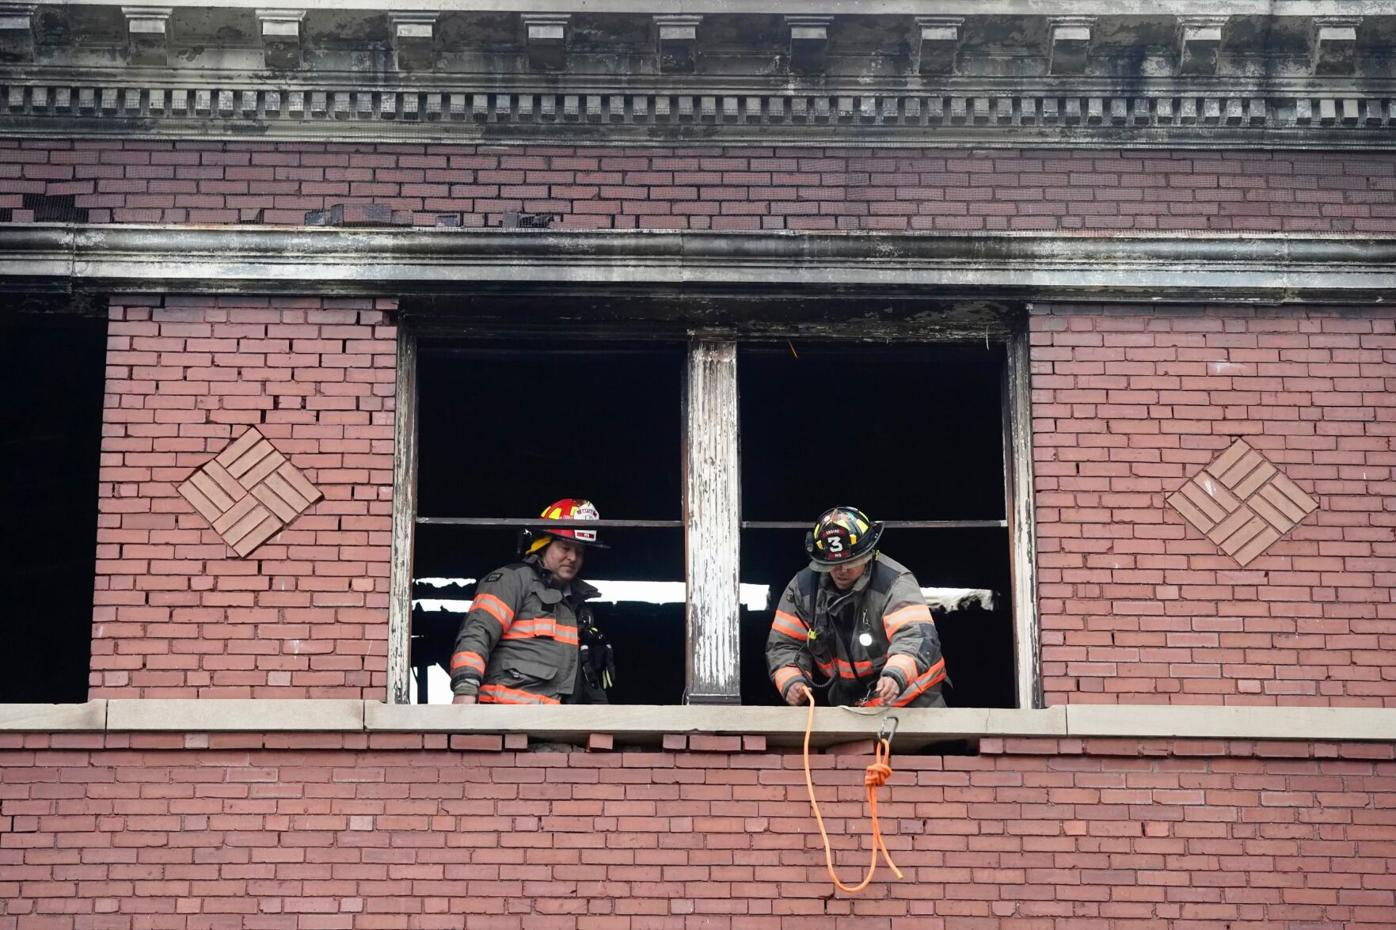 Firefighters in building window